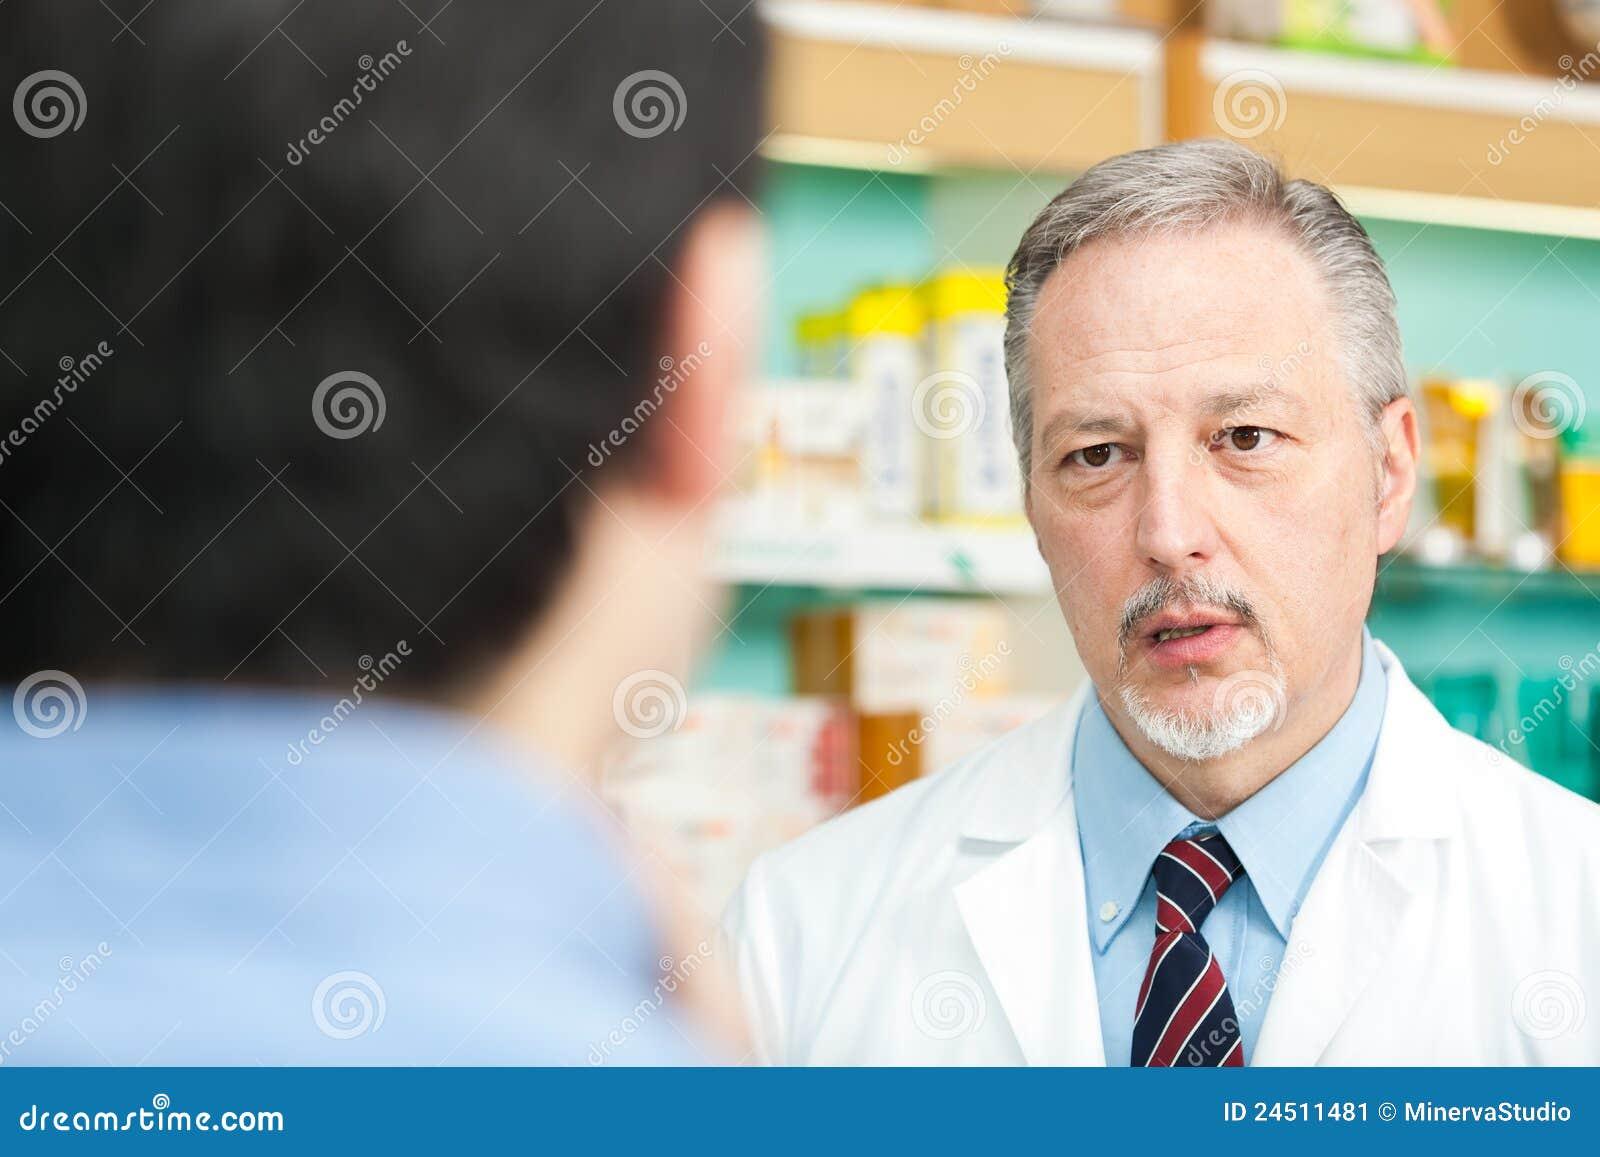 Canadian pharmacy cialis no prescription